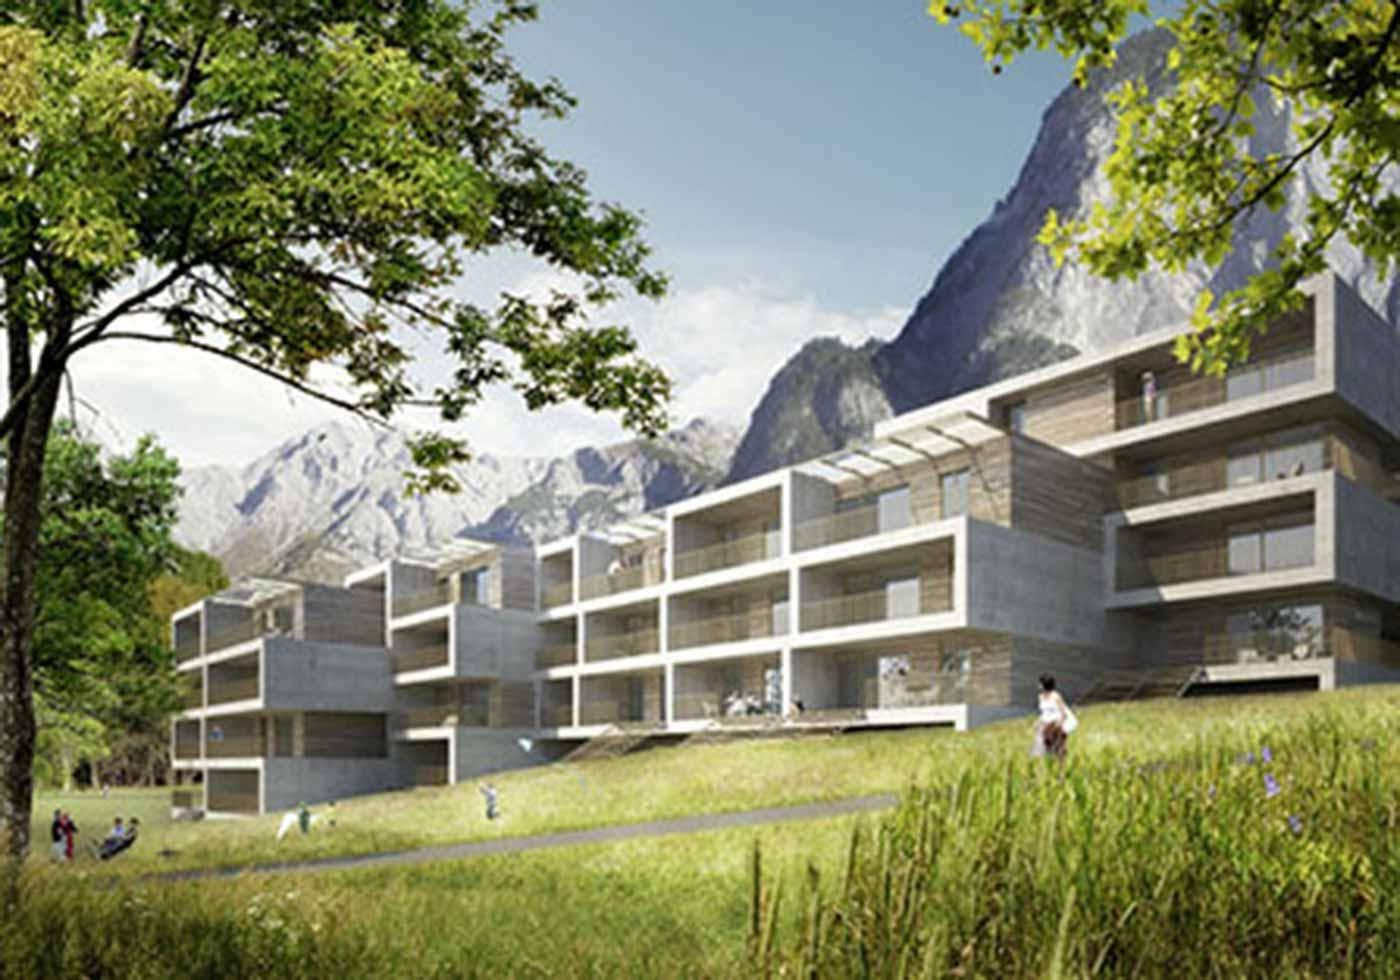 Wohnbau, Anna-Dengel-Straße, Innsbruck, AT